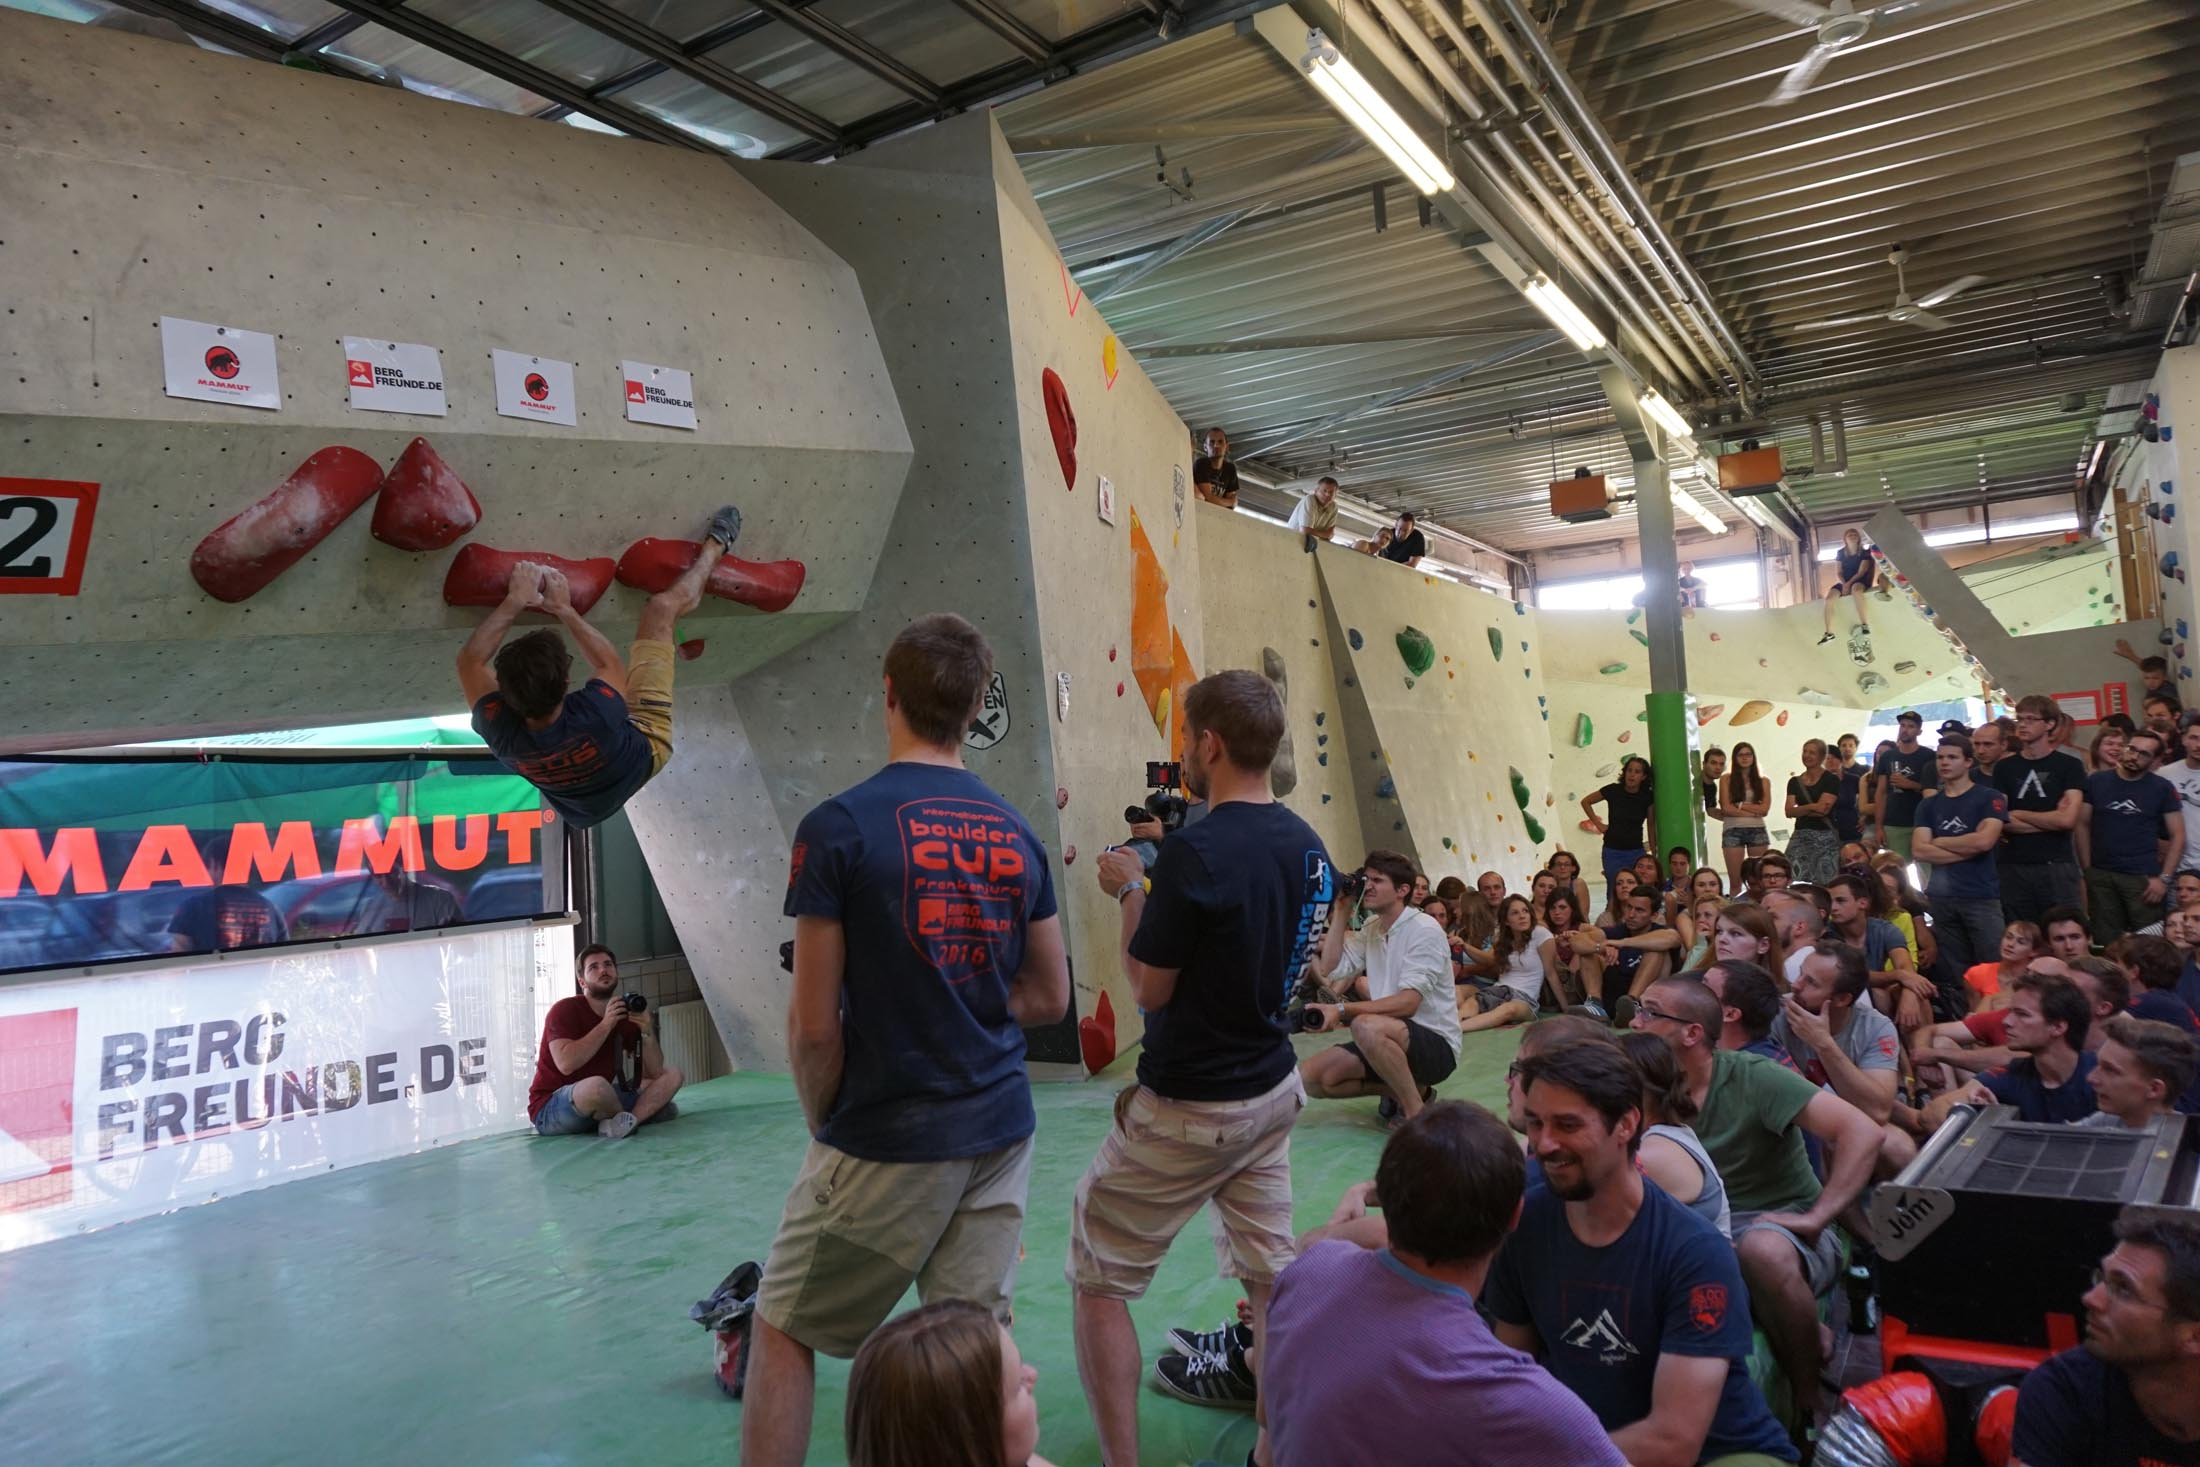 Finale, internationaler bouldercup Frankenjura 2016, BLOCKHELDEN Erlangen, Mammut, Bergfreunde.de, Boulderwettkampf07092016606